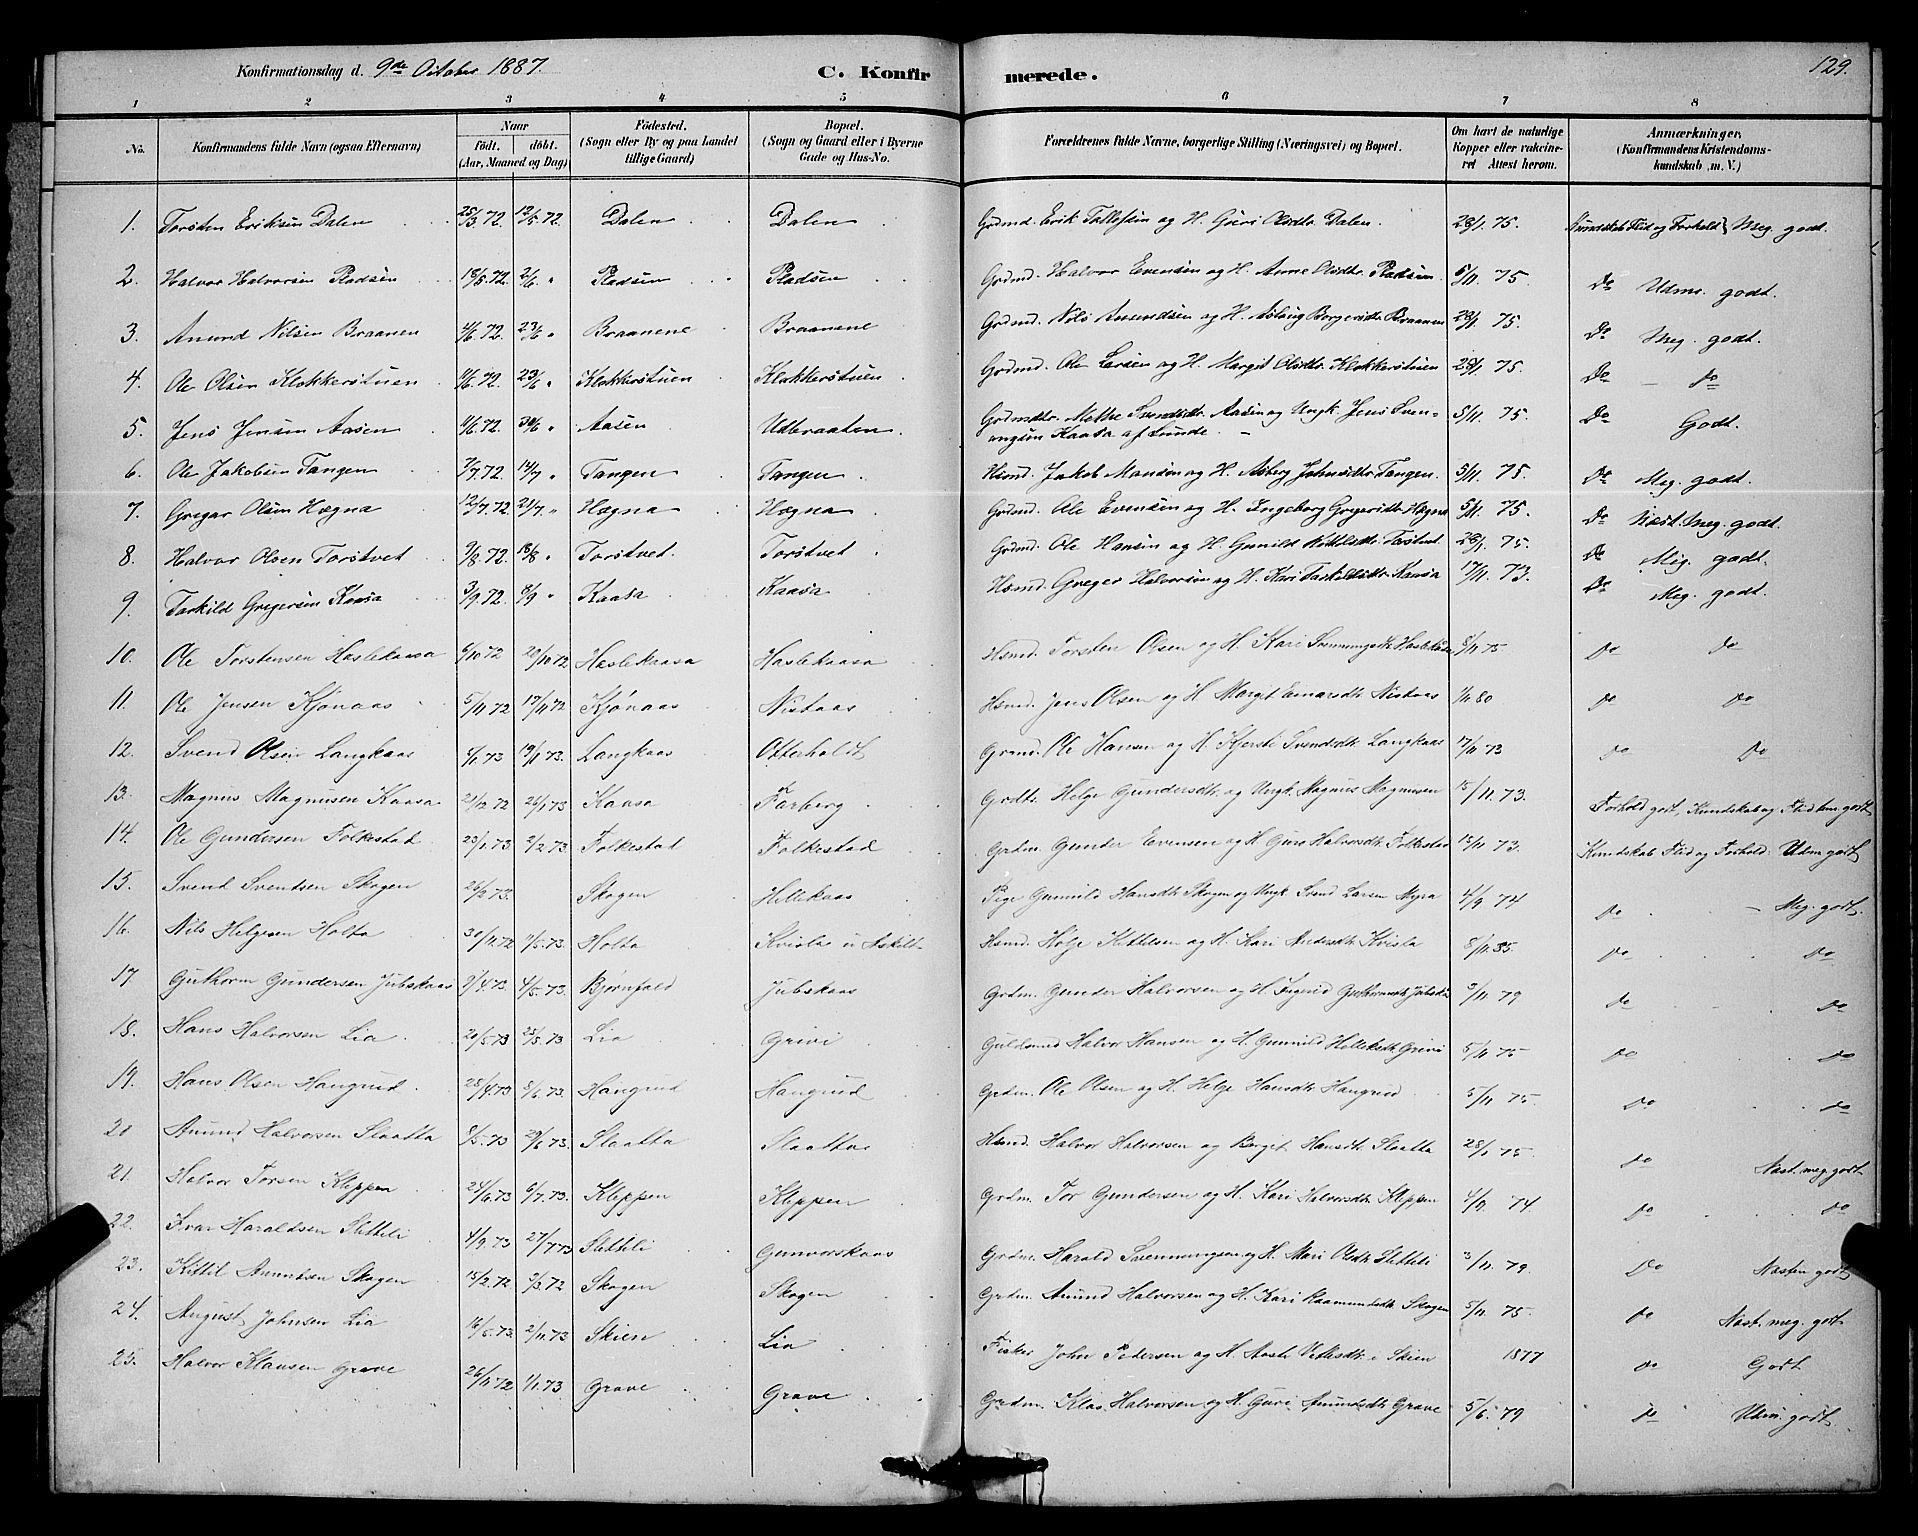 SAKO, Bø kirkebøker, G/Ga/L0005: Klokkerbok nr. 5, 1883-1897, s. 129